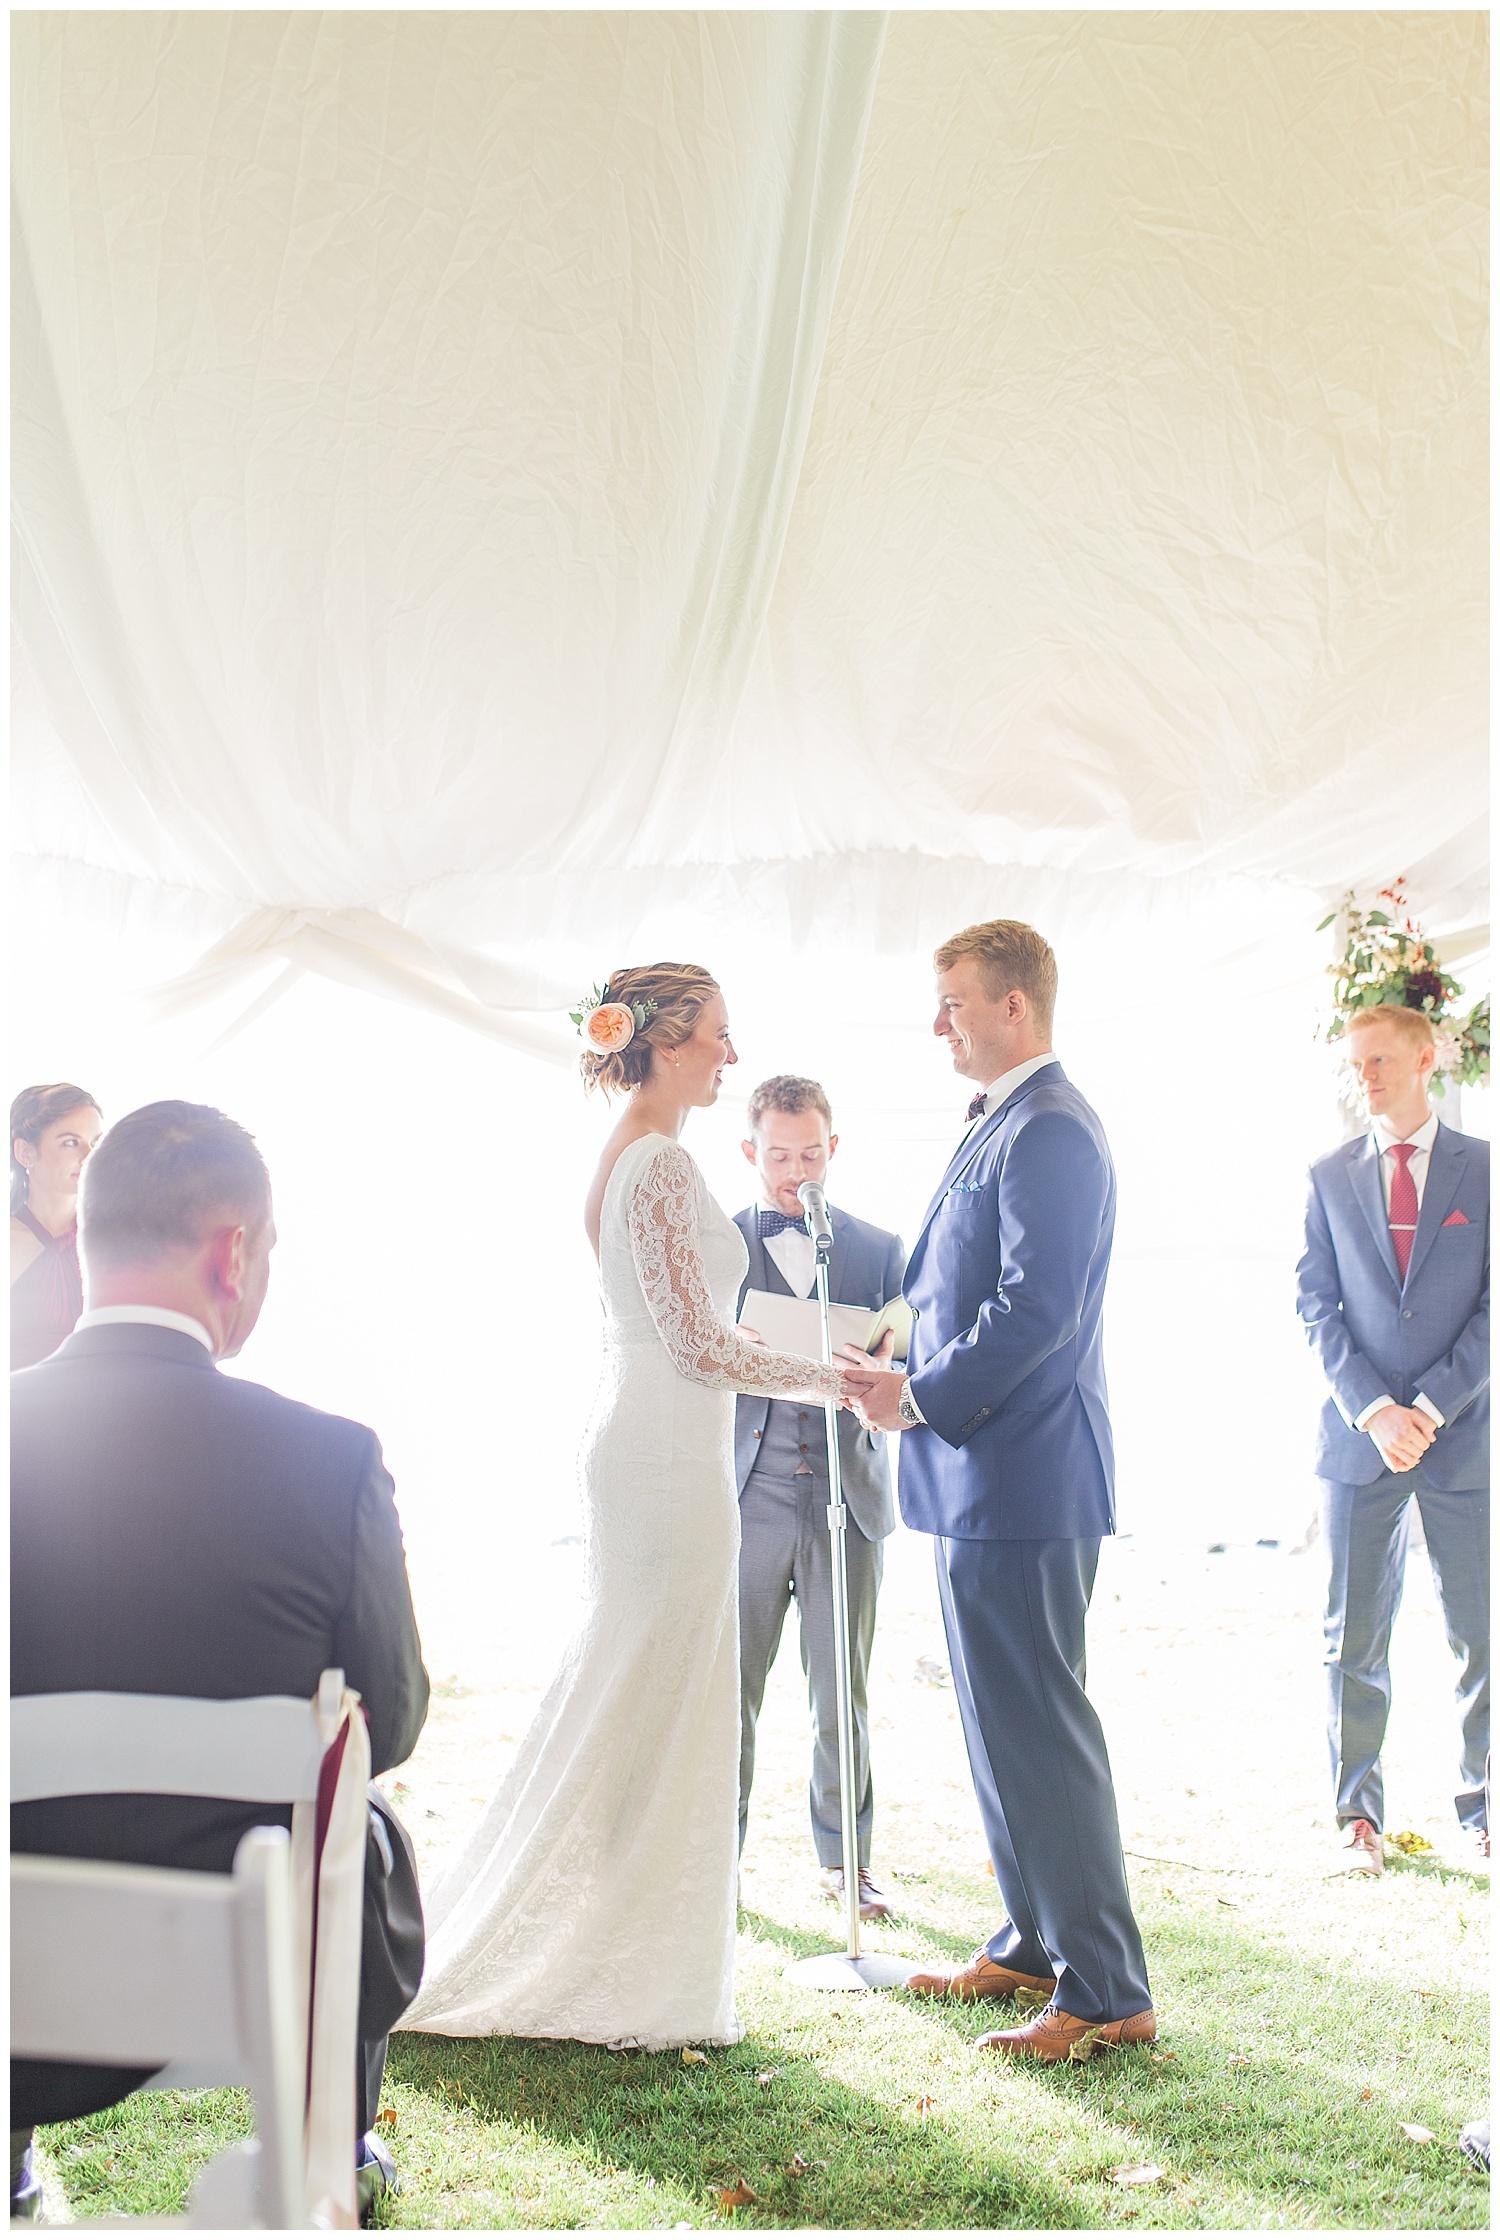 Margaret and Colin - Inns of Aurora - Lass and Beau-1017_Buffalo wedding photography.jpg